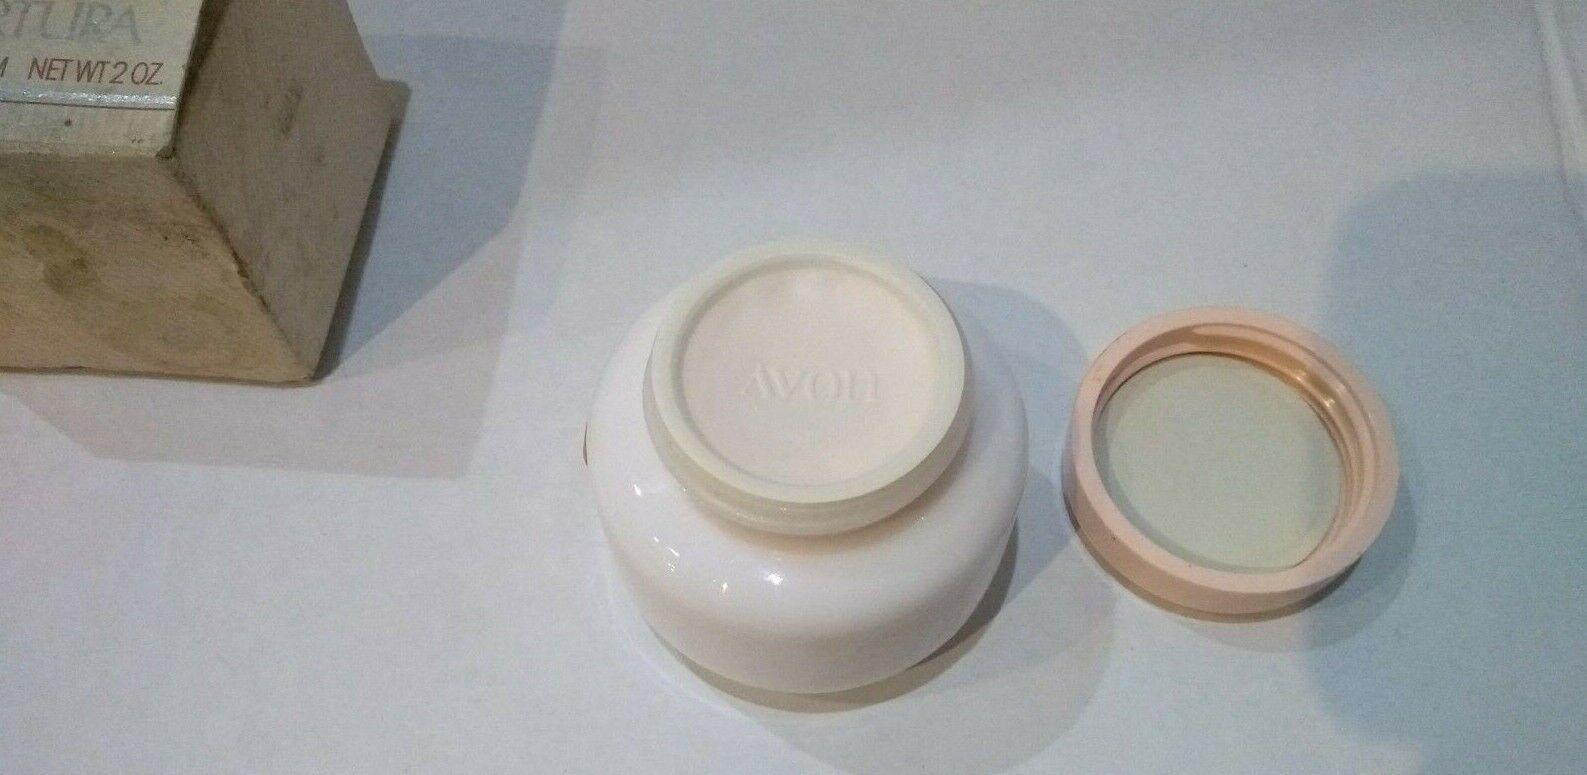 Vintage Avon Nurtura Replenishing Face Cream Milk Glass Jar 2 oz. New Old Stock